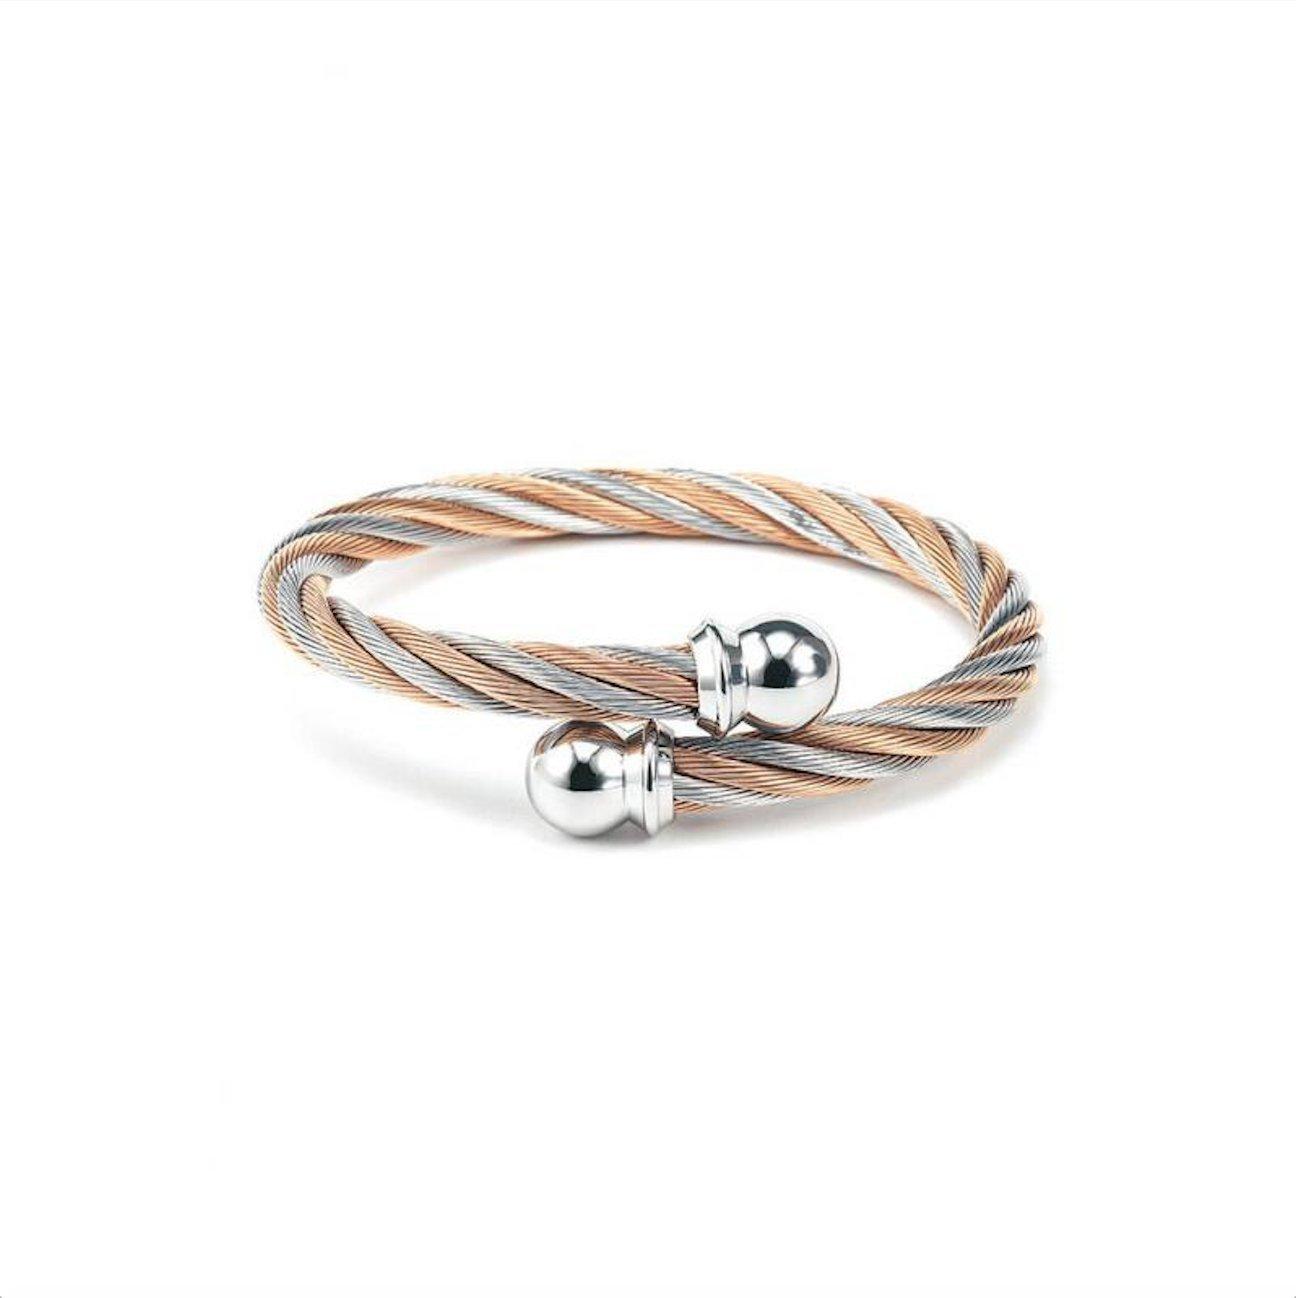 New Charriol Celtic Jewels Bracelet Bangle 04-901-1216-0 Medium Unisex Jewelry